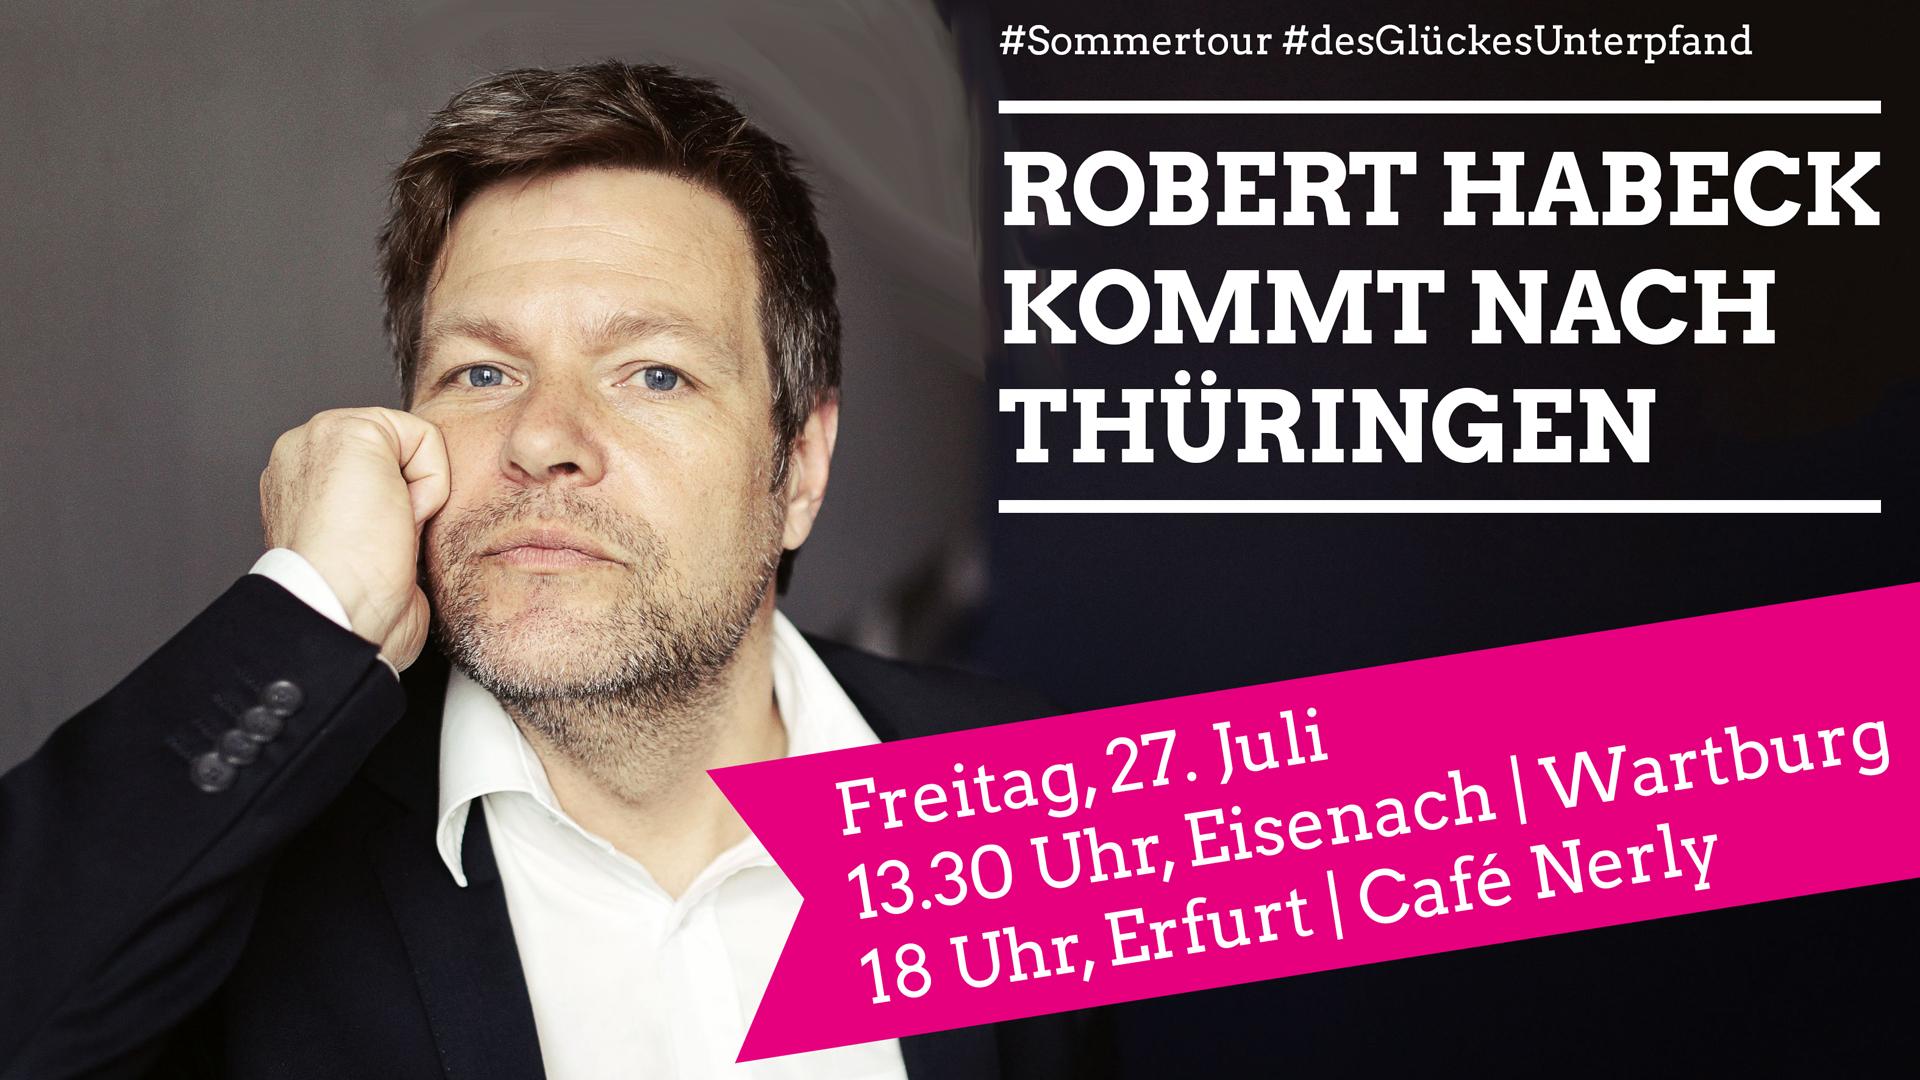 Robert Habeck kommt am 27. Juli nach Thüringen